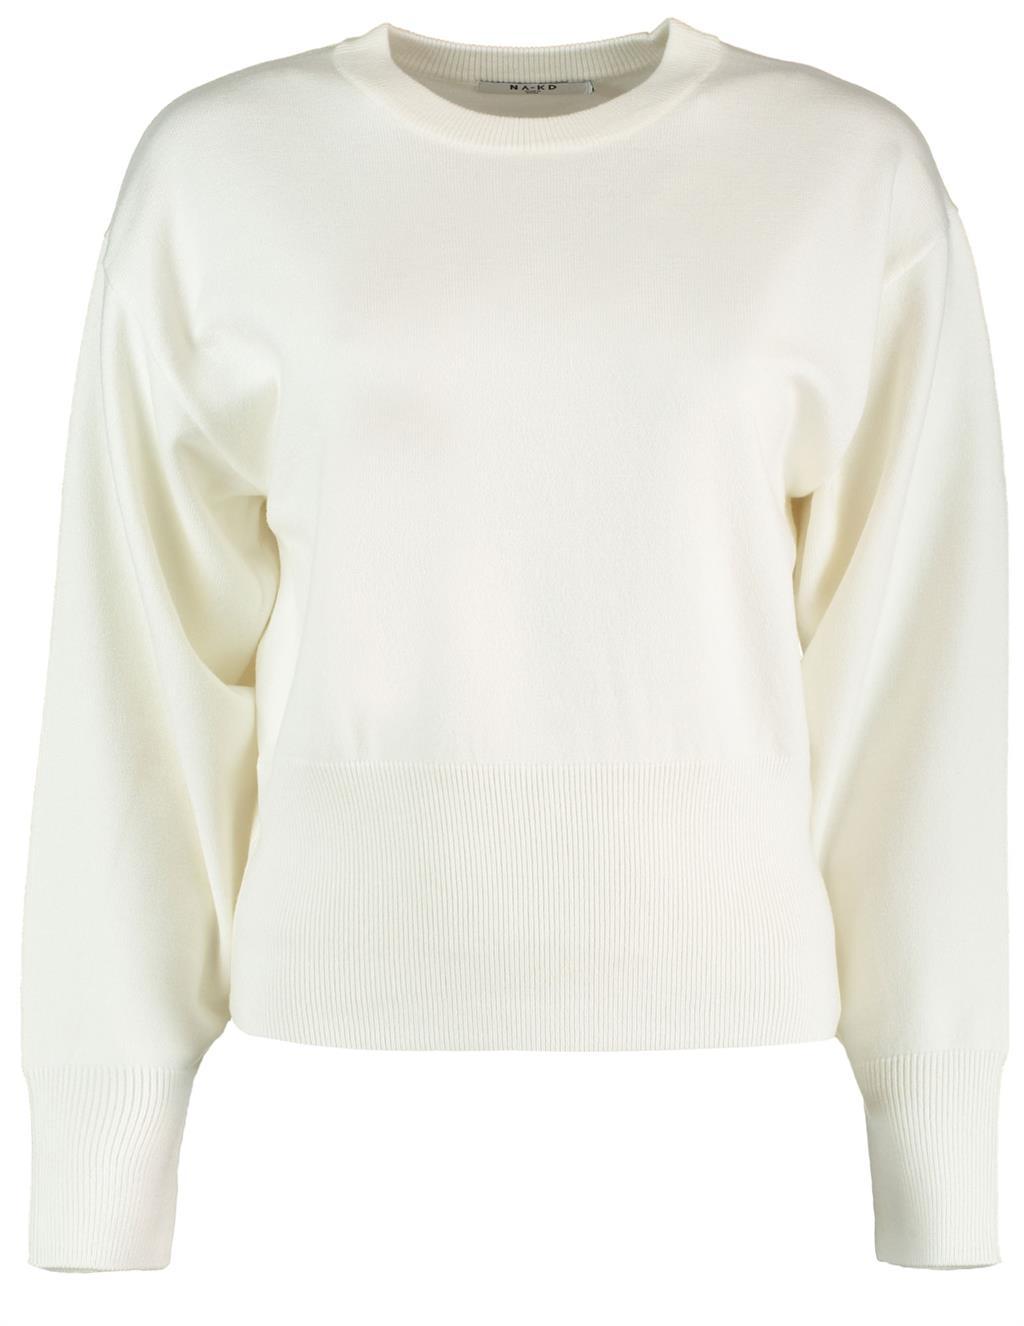 Witte dames trui Na-kd - 1018-004601 off white